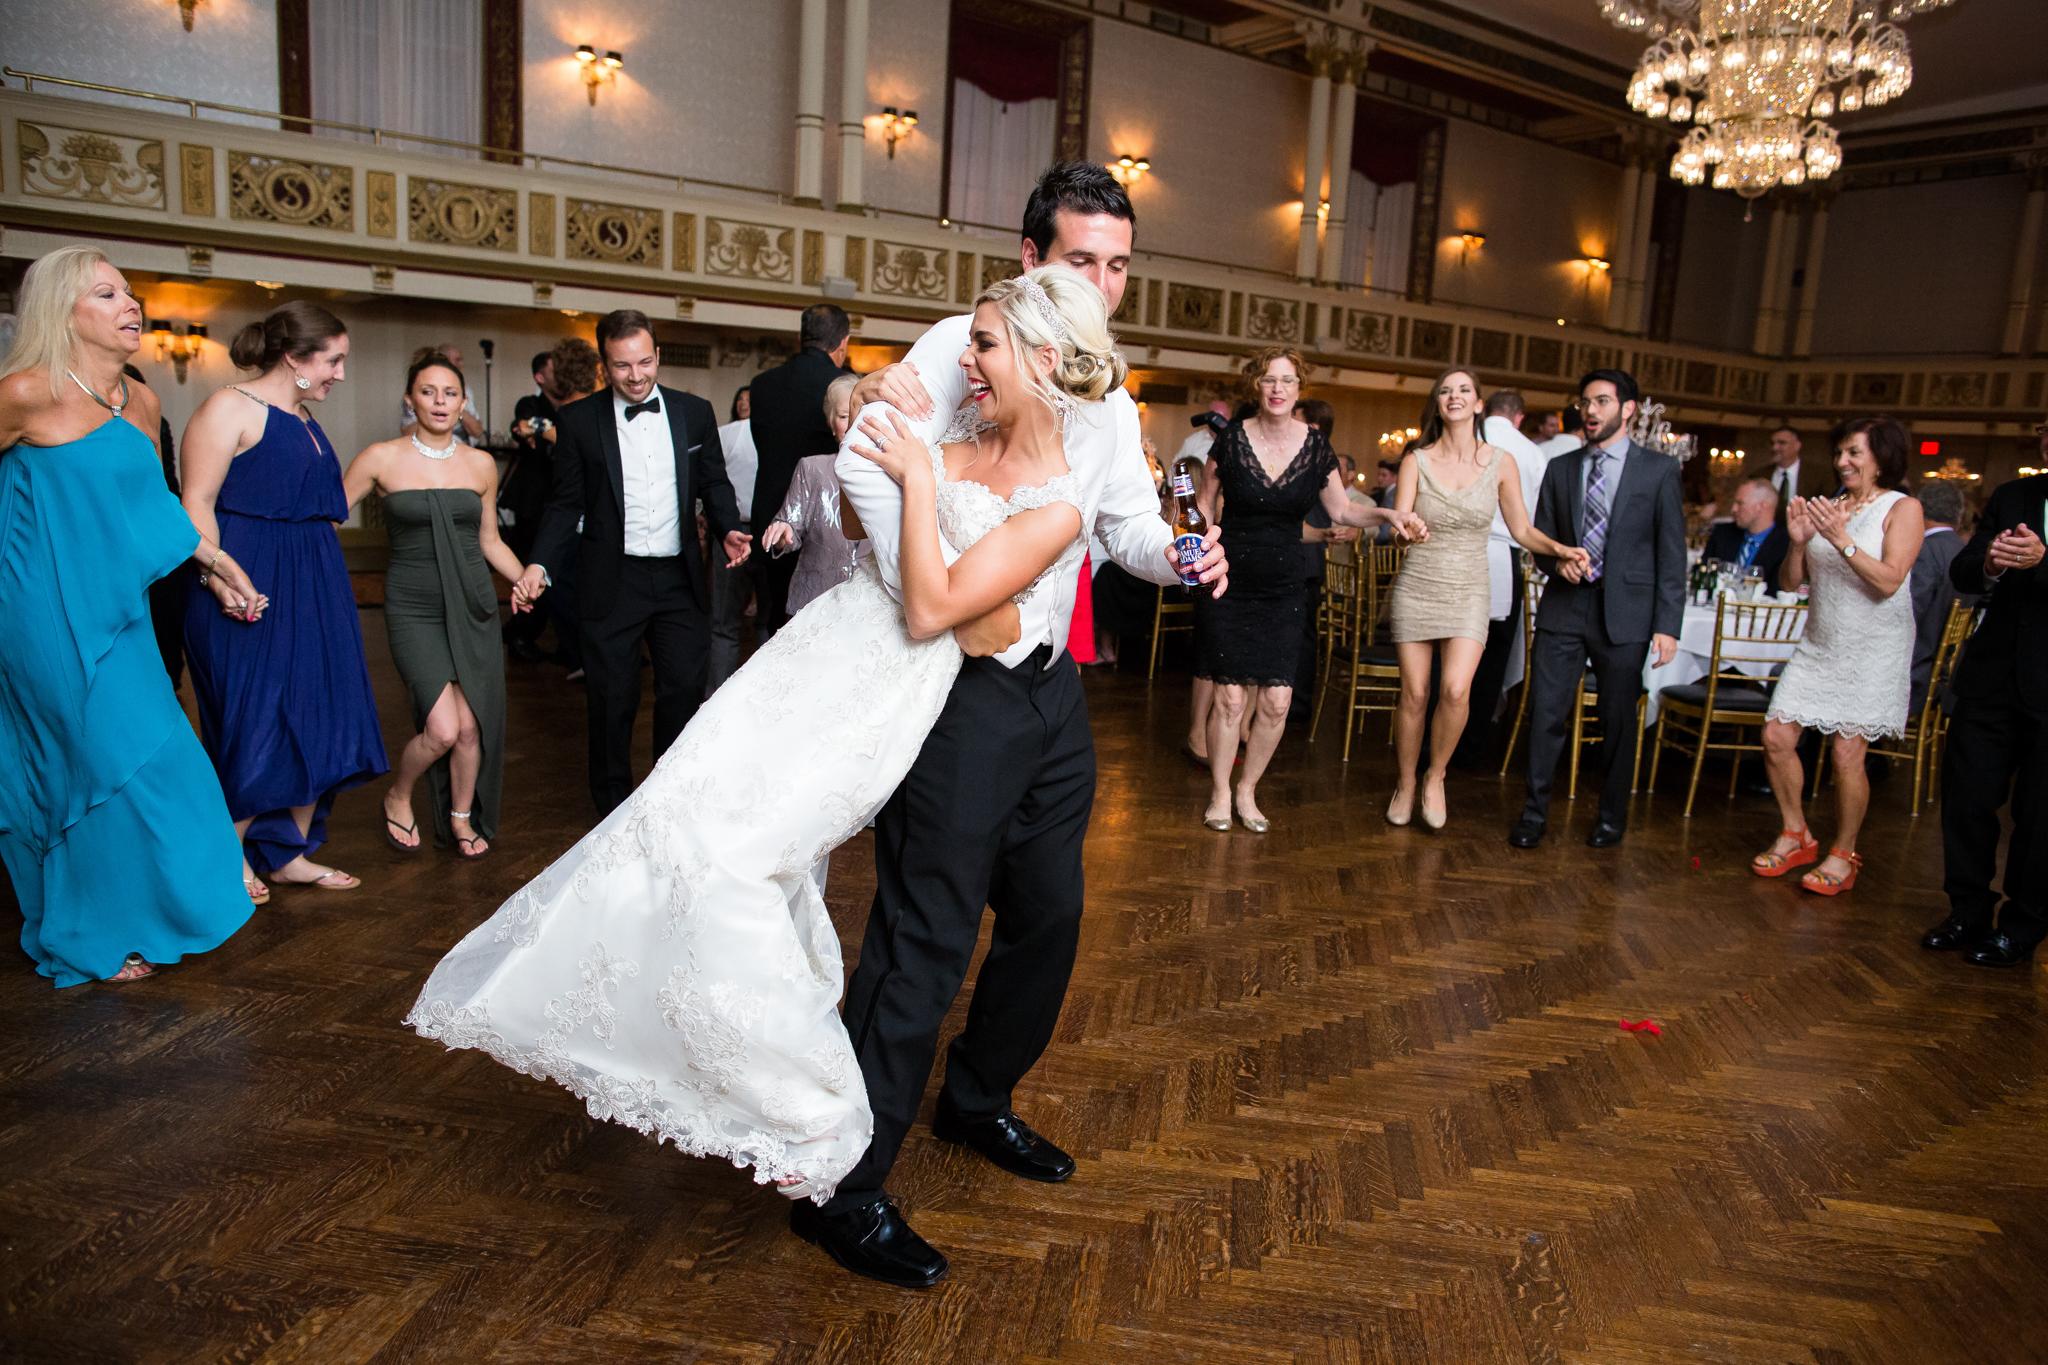 Statler-City-Buffalo-wedding-photographer- 0653.jpg